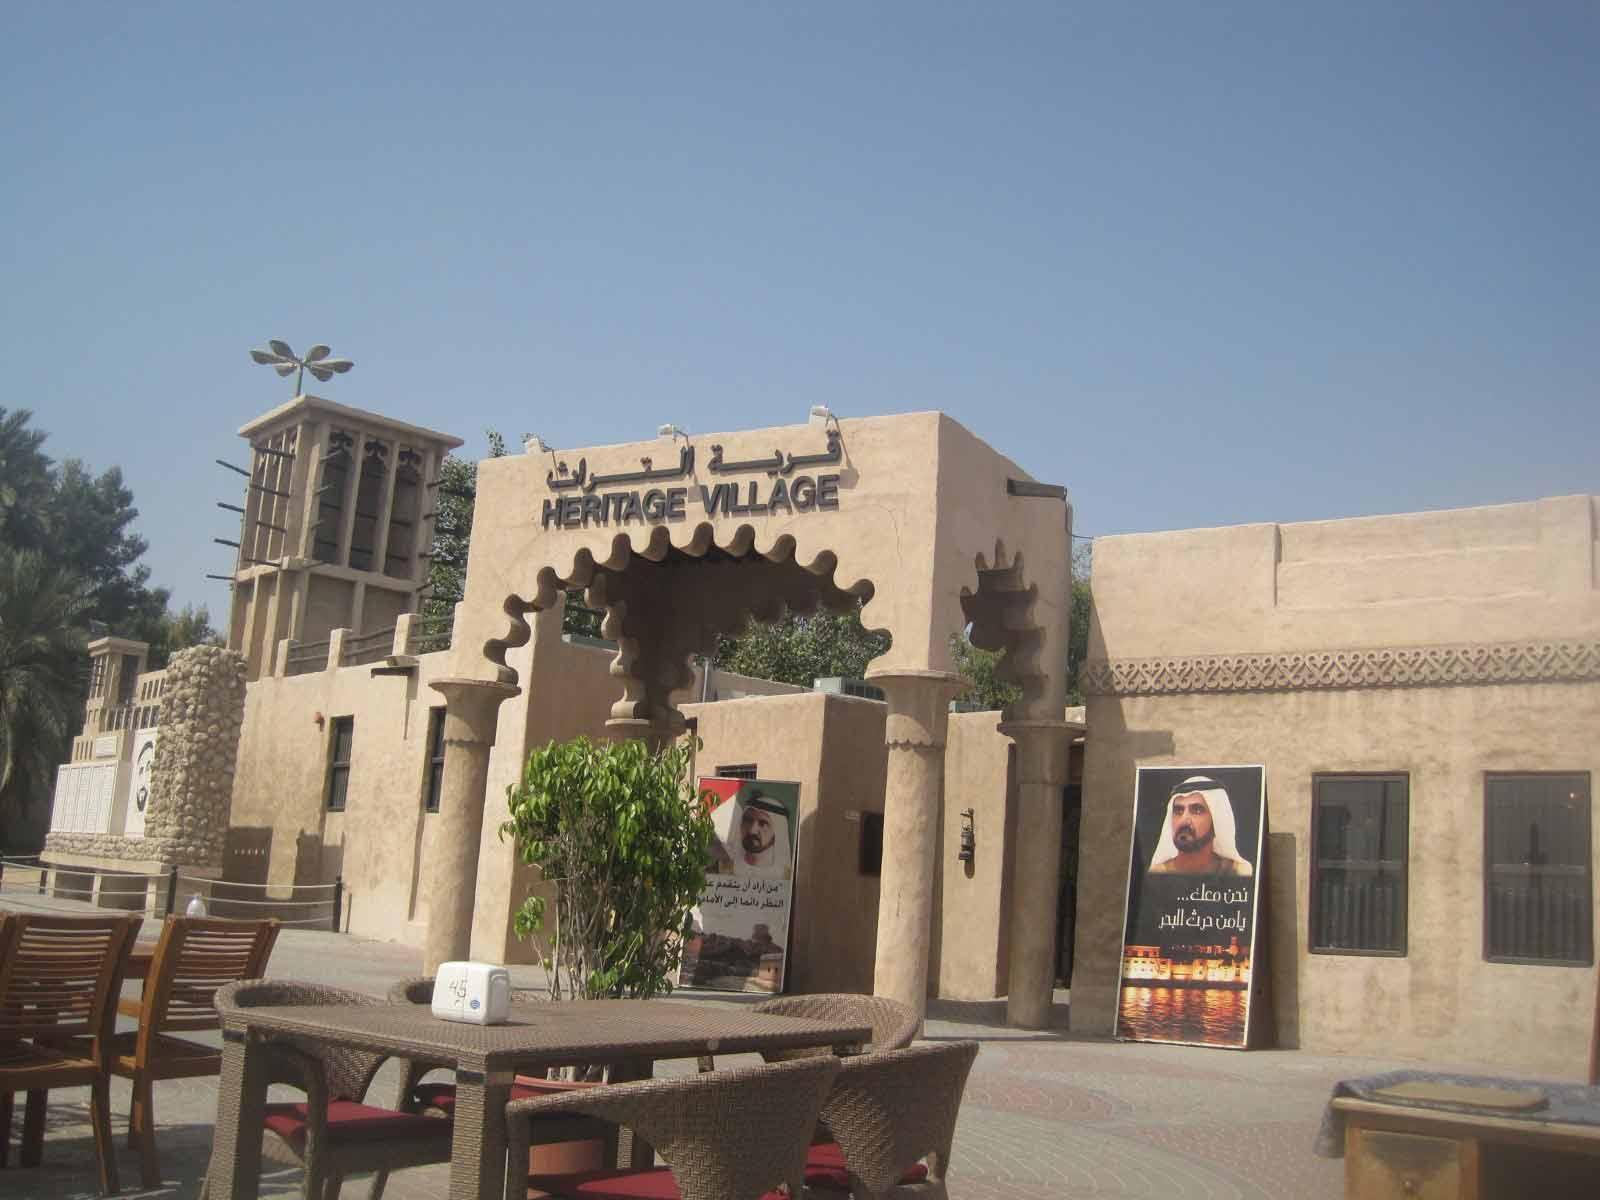 Heritage Village in Dubai